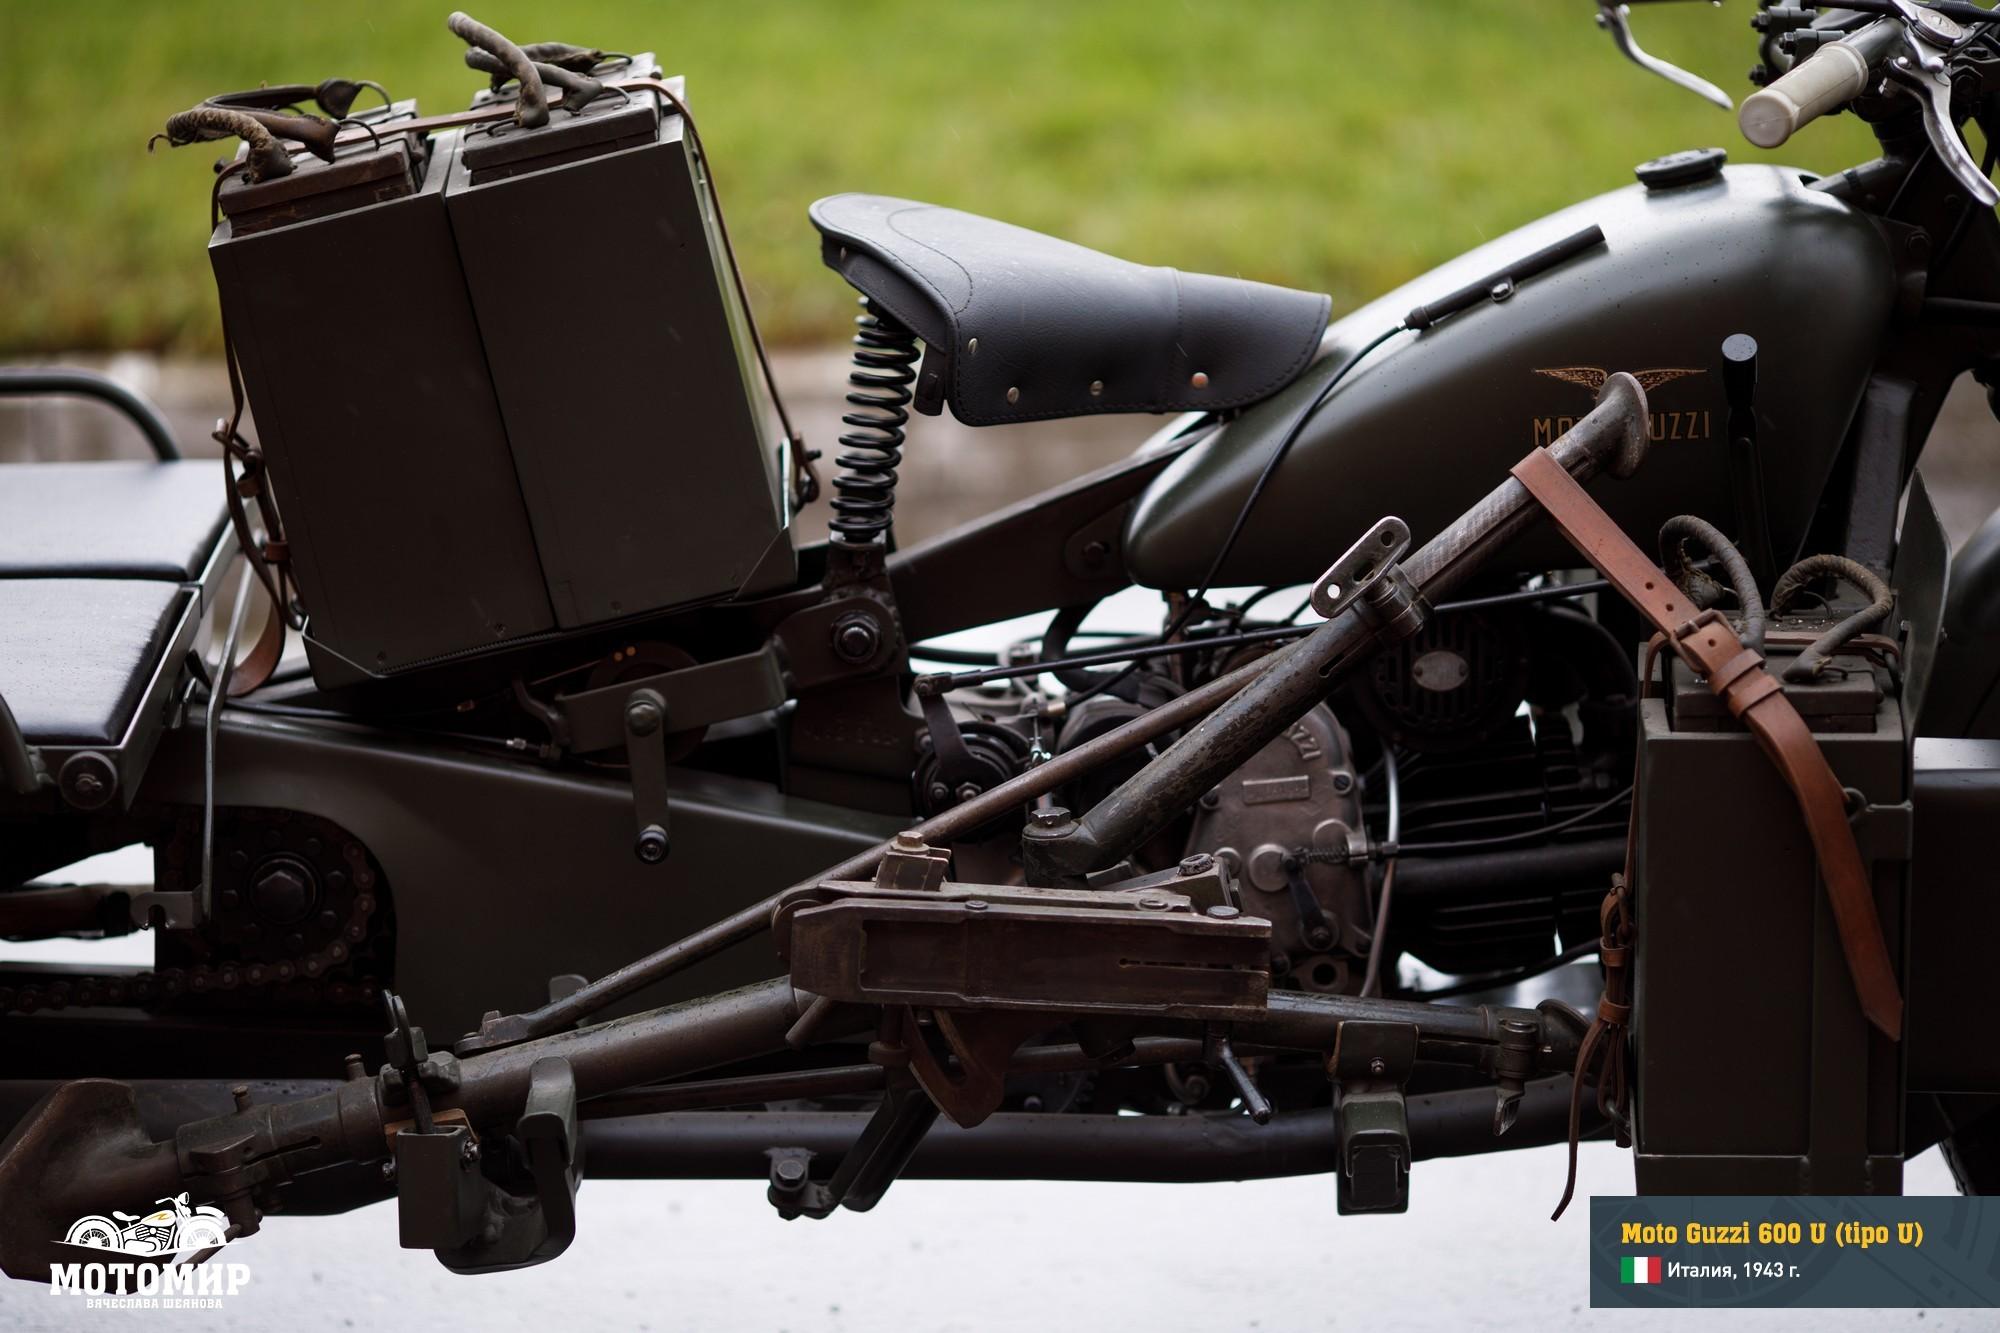 moto-guzzi-600-u-web-14